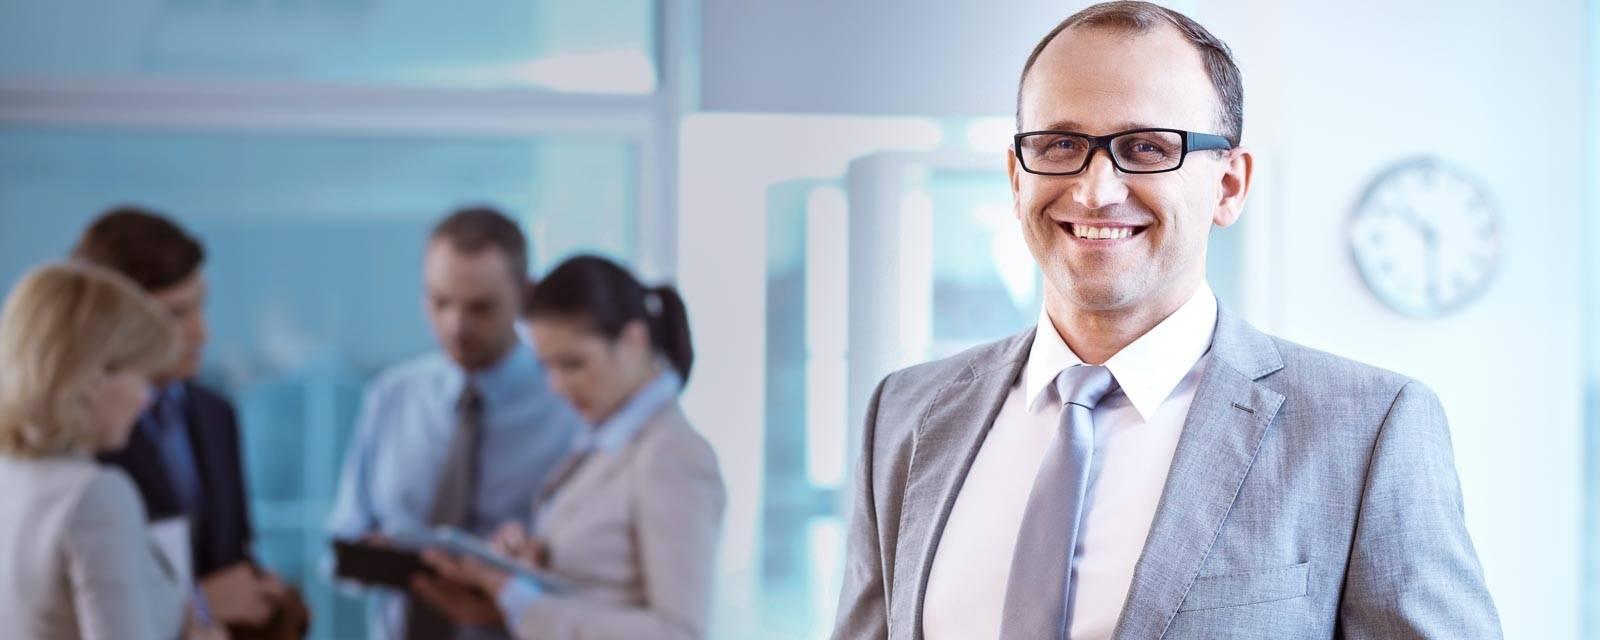 Arbeitgeber-attraktivitaet-employer-branding